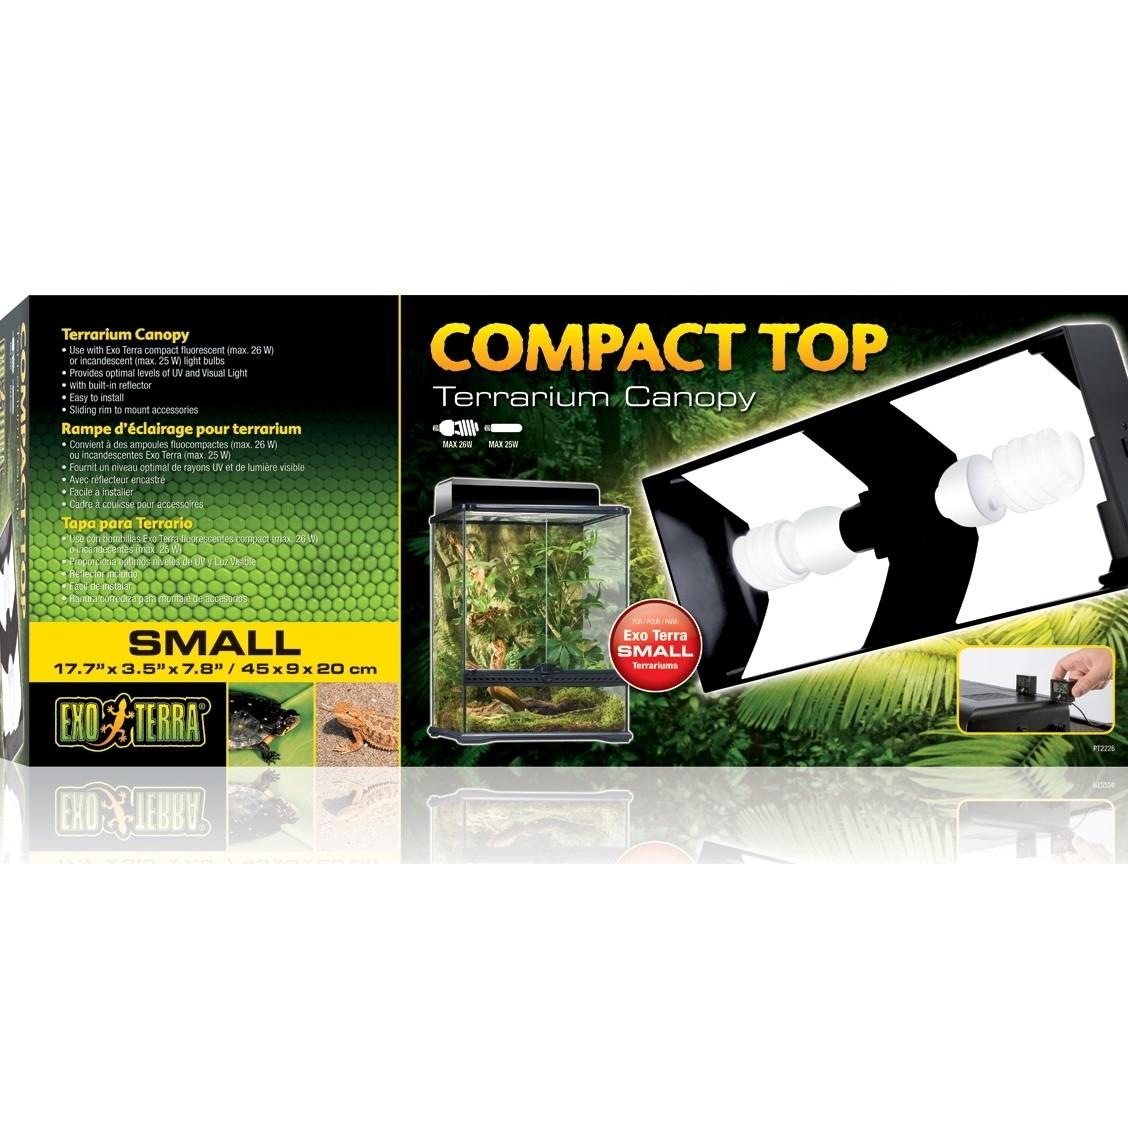 Exo Terra Compact Top - Abdeckung für Terrarienlampen, Bild 3